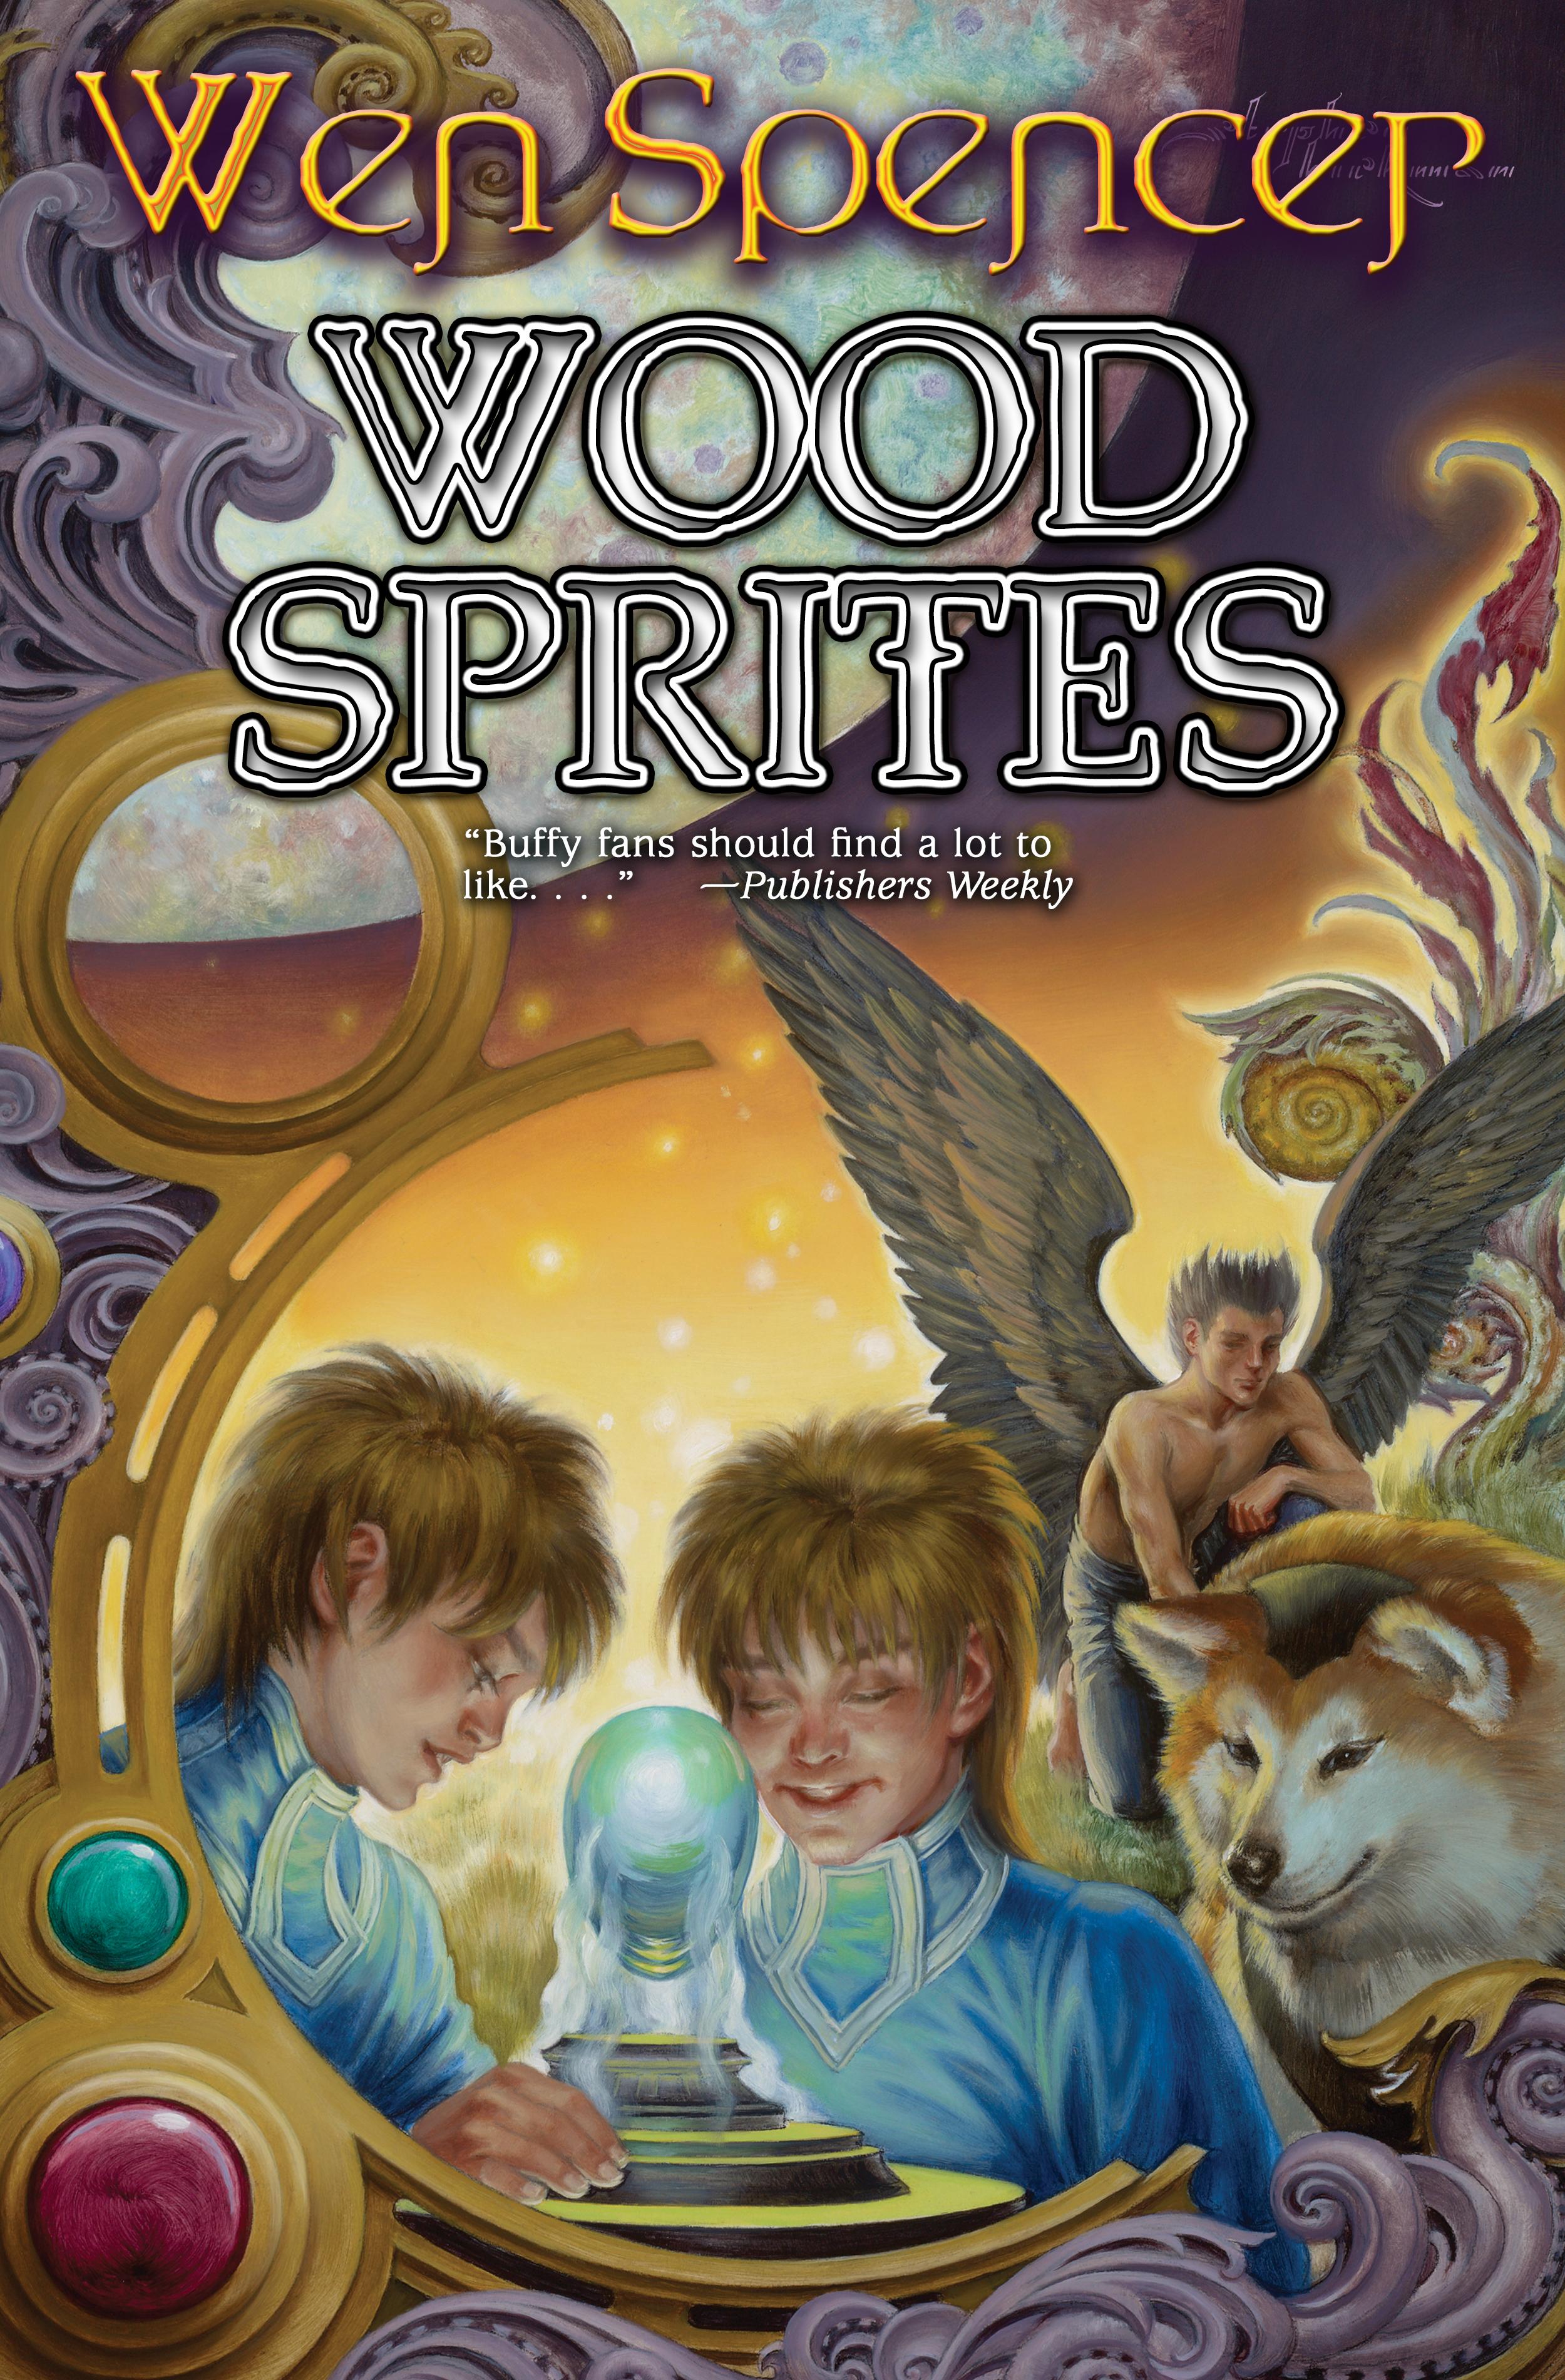 Wood sprites 9781476736716 hr